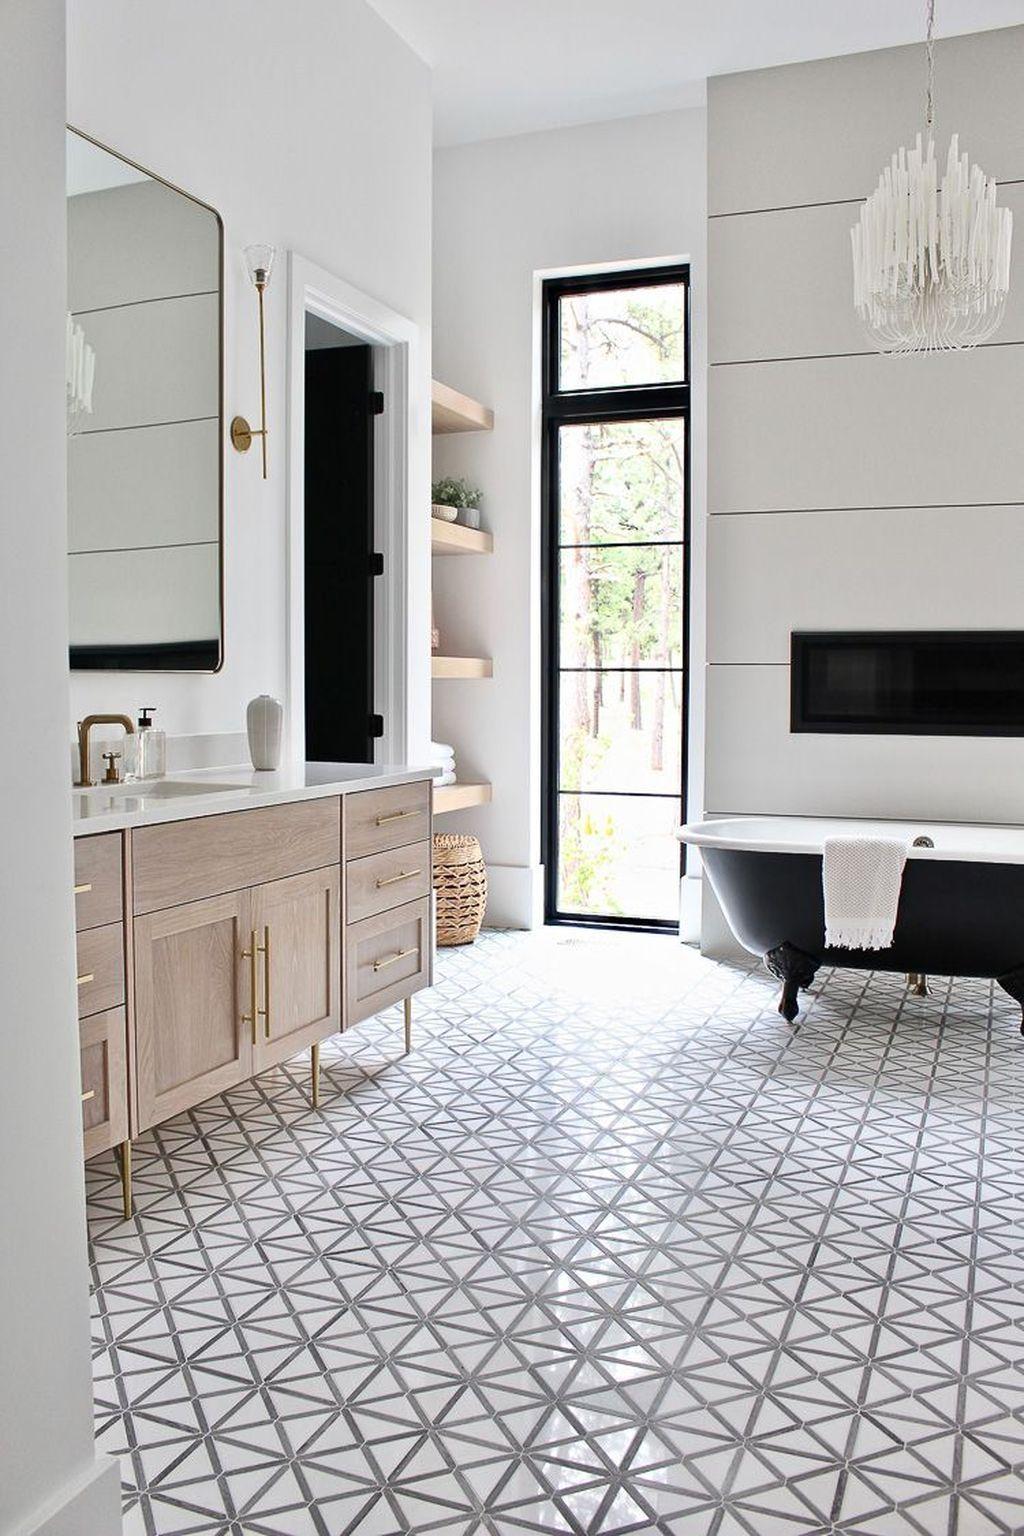 42 Amazing Contemporary Bathroom Design Ideas | Bathroom | Pinterest ...